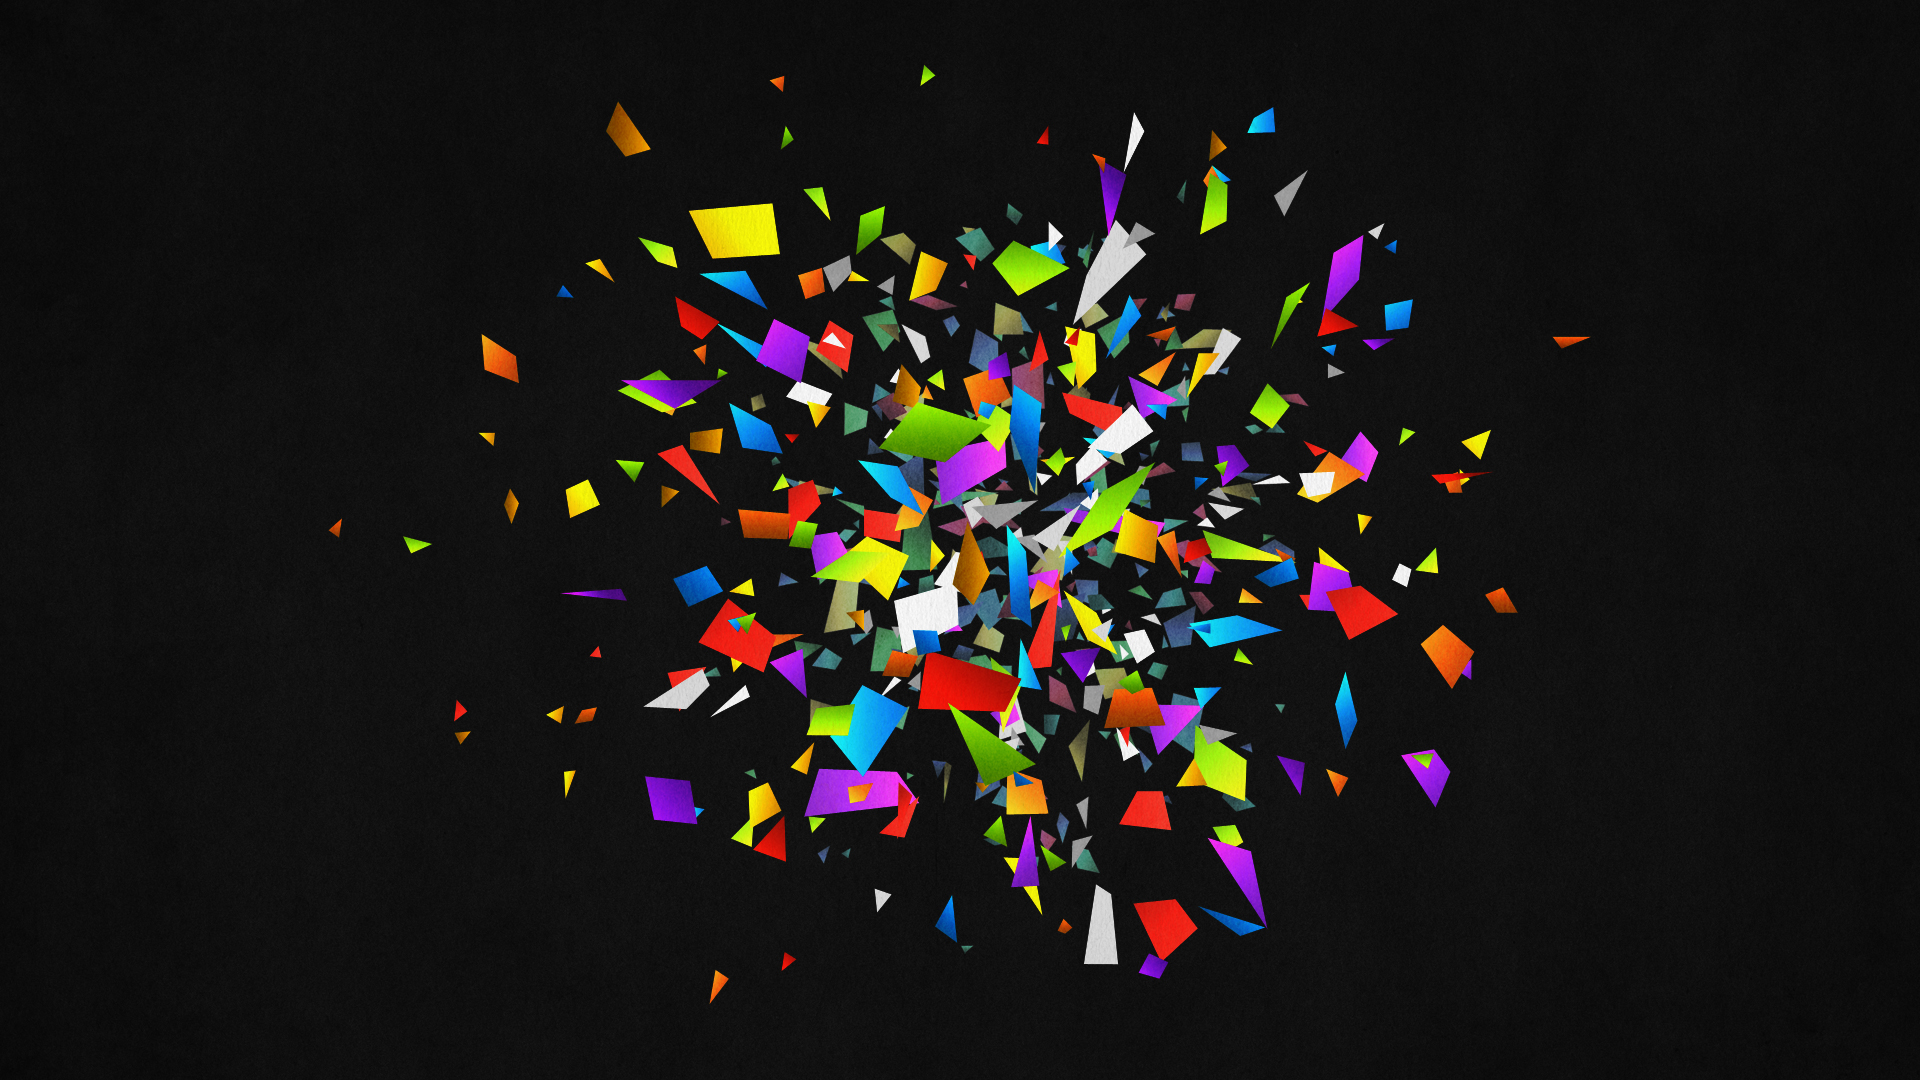 pieces abstract black color rainbow vector 3d wallpaper